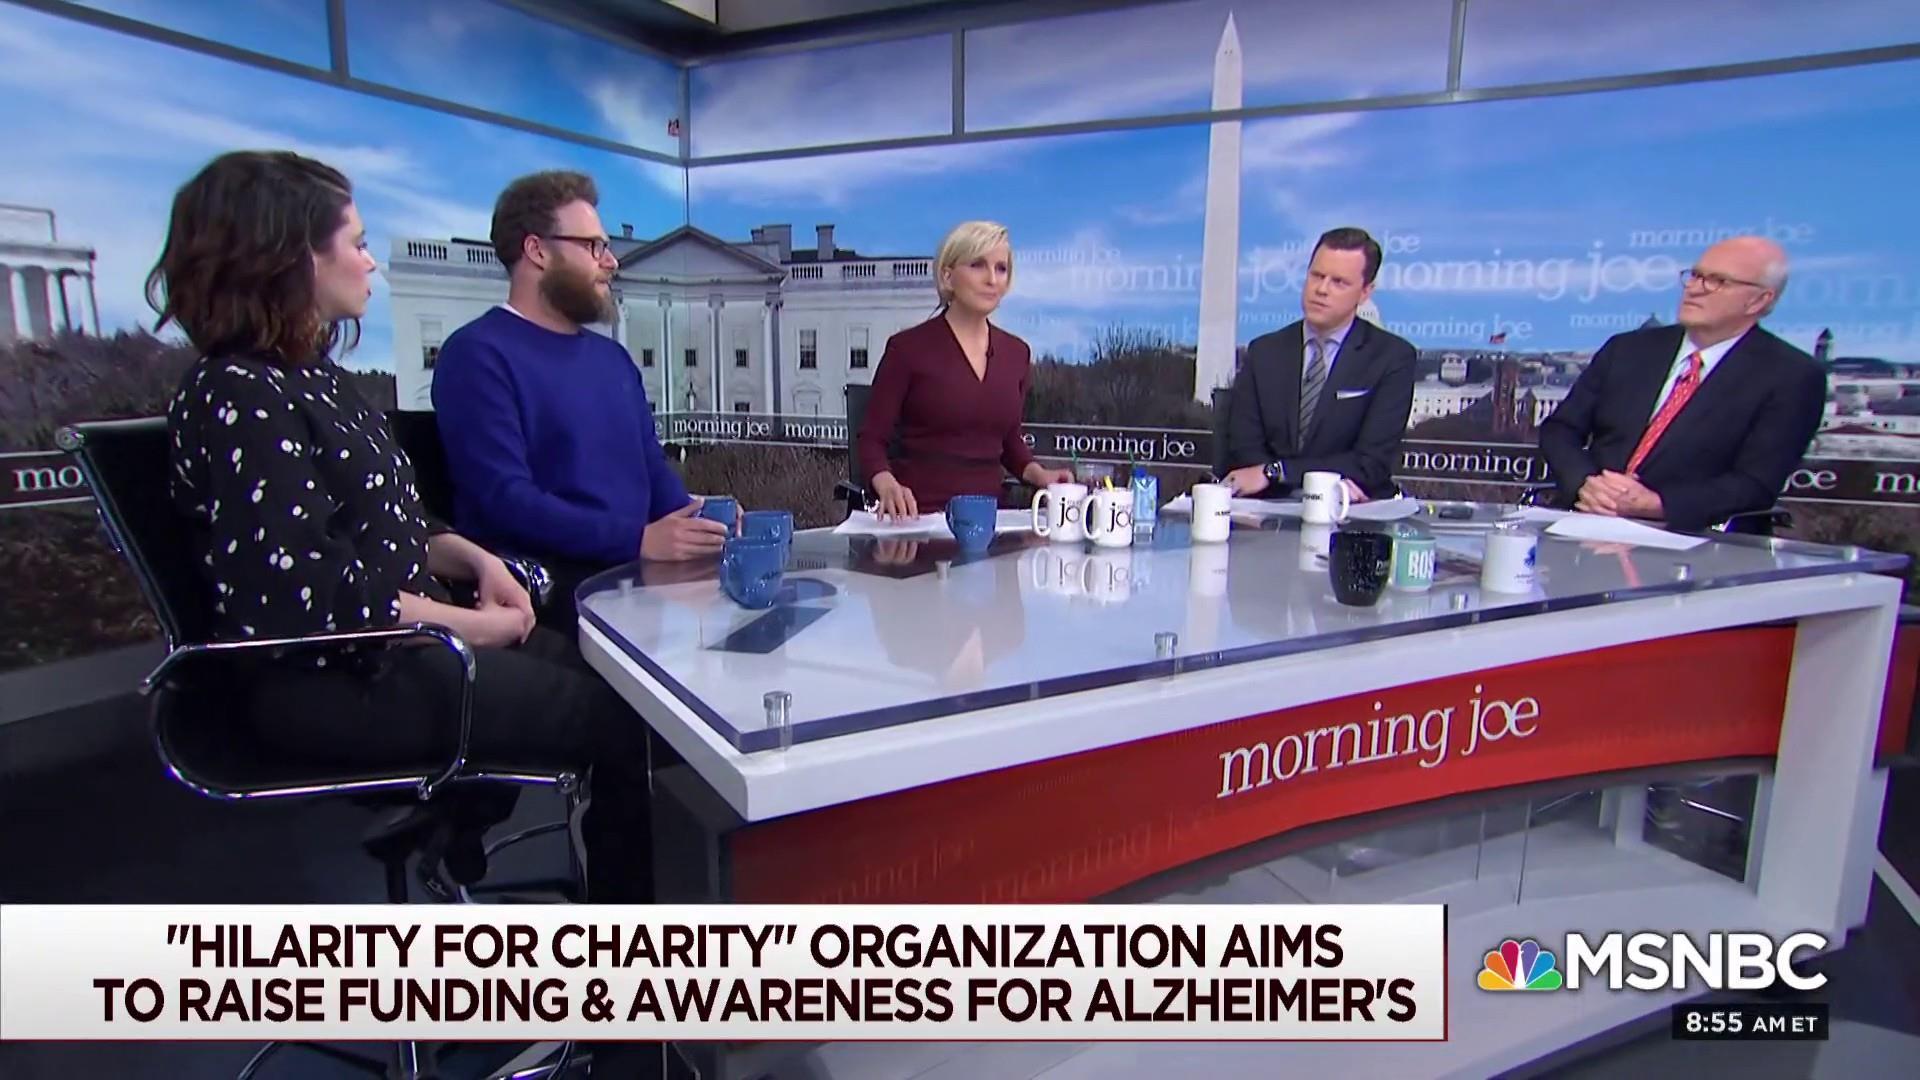 Seth, Lauren Rogen on why fighting Alzheimer's is personal